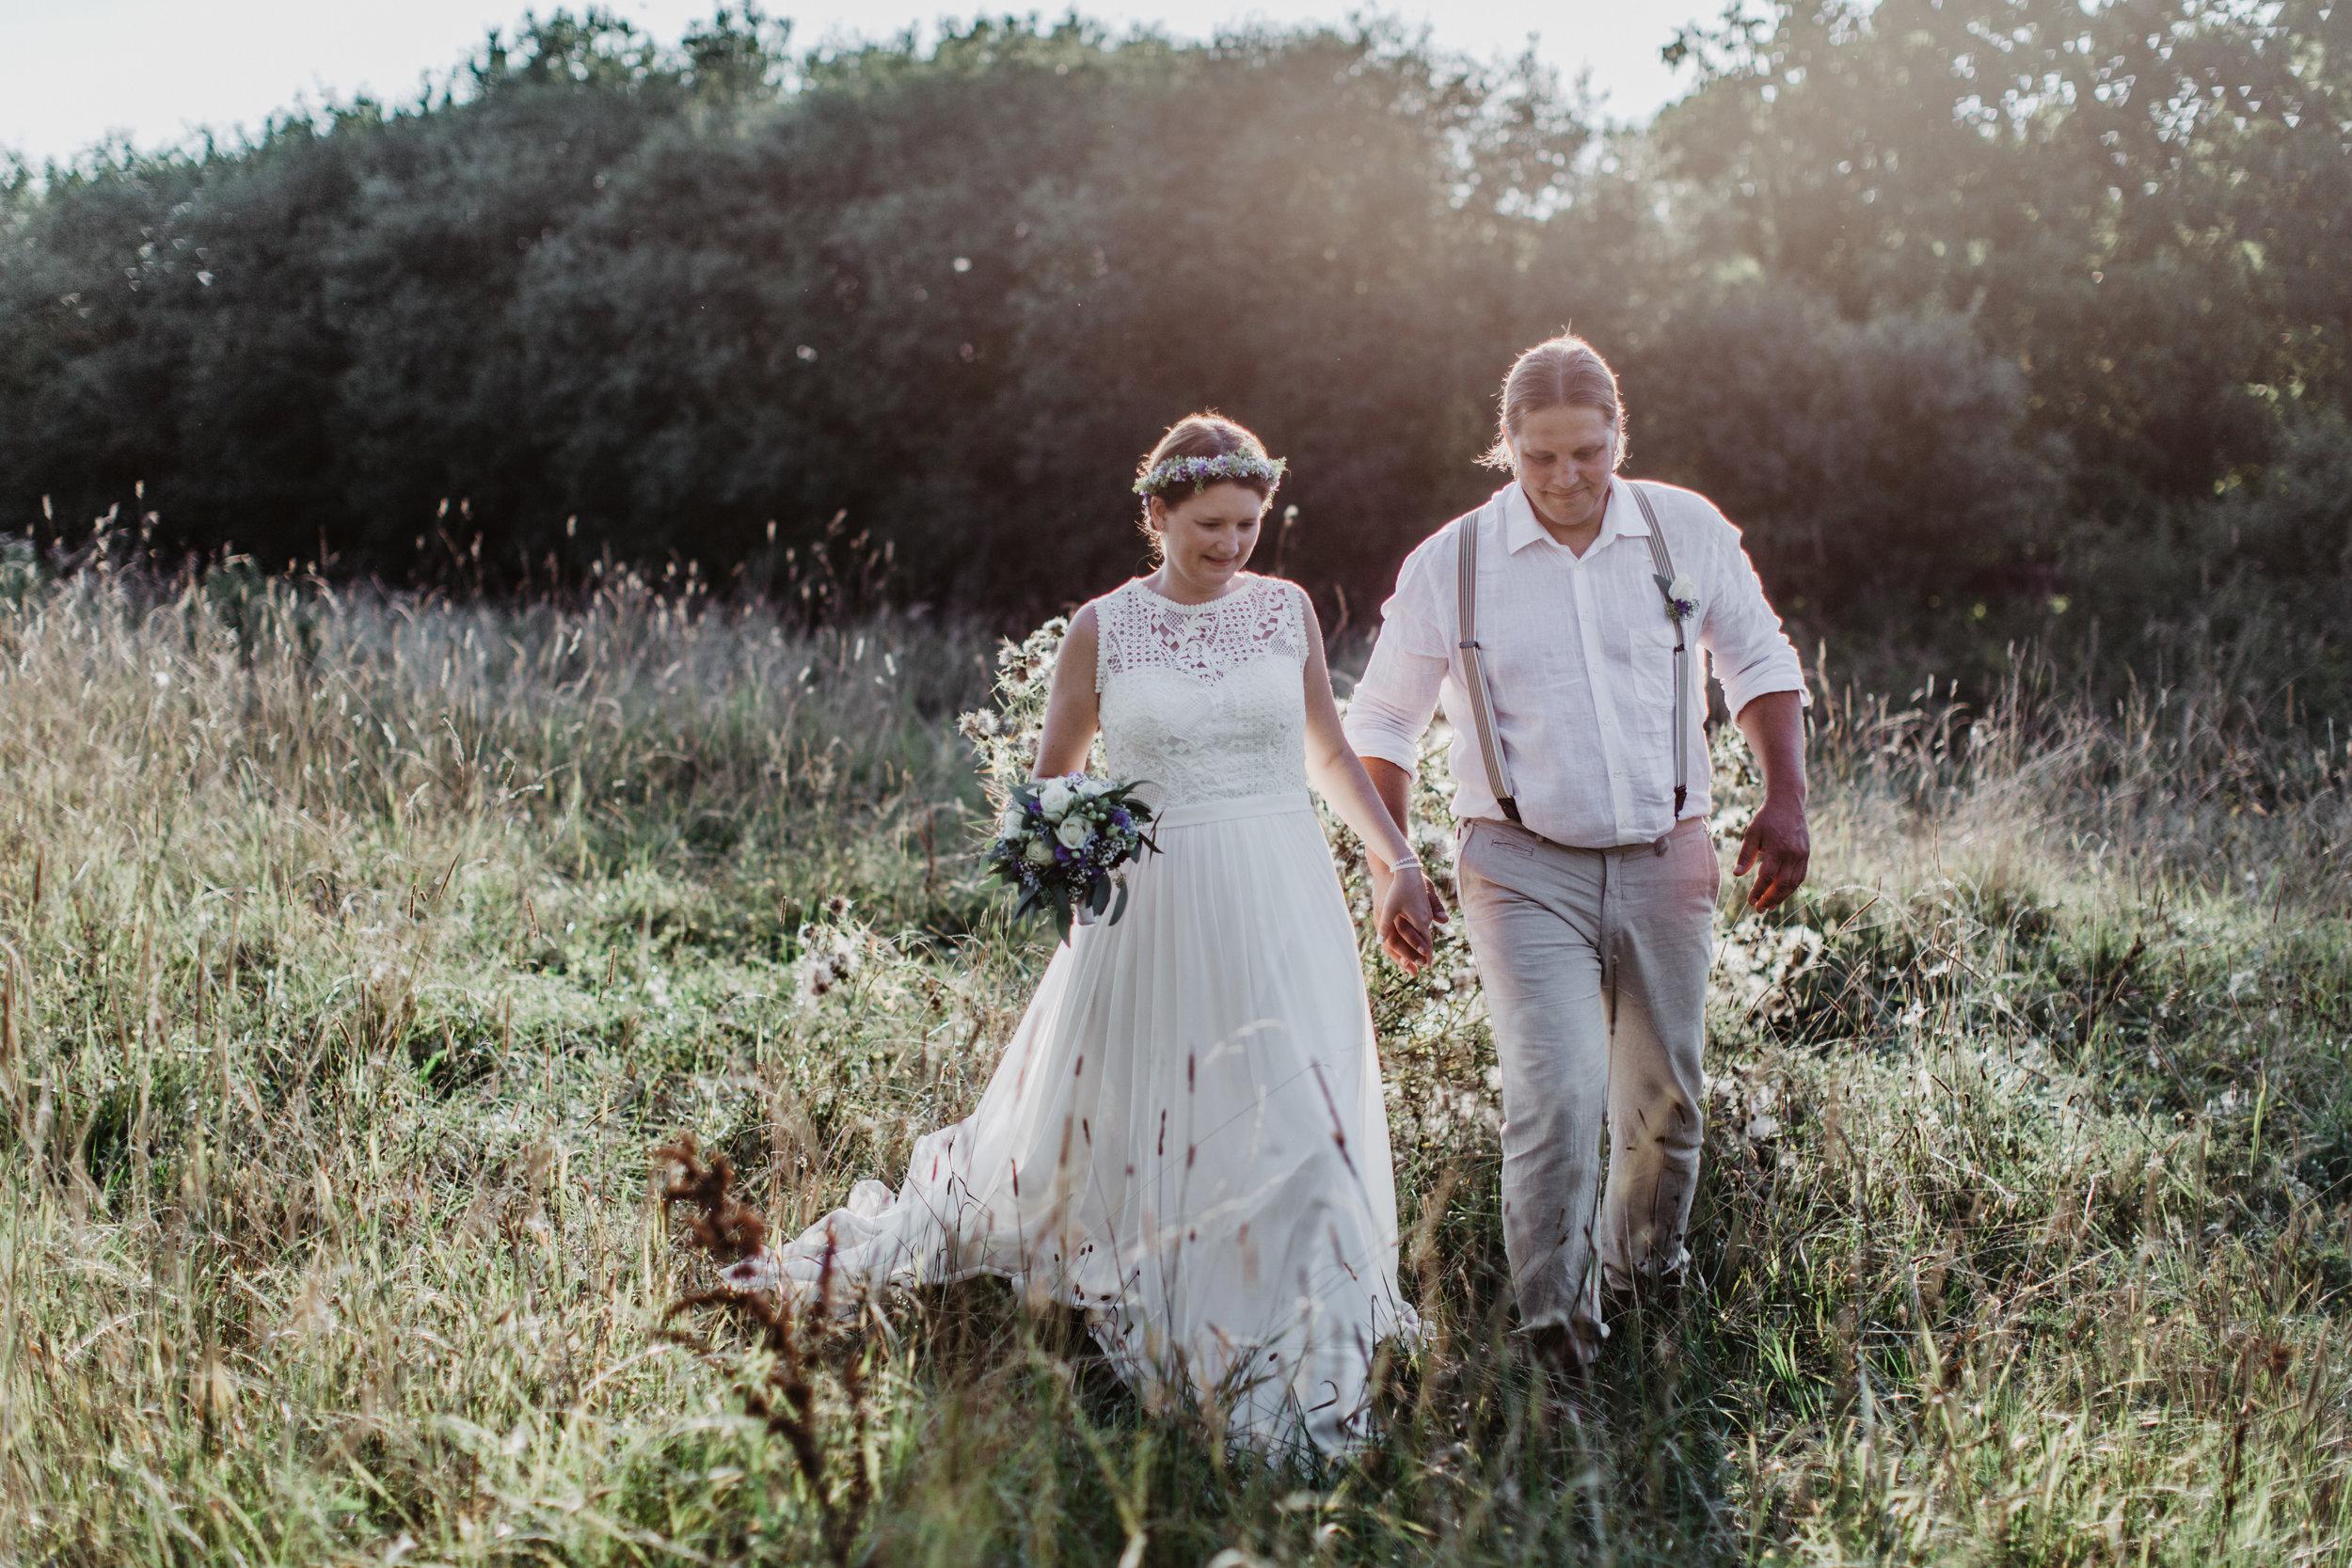 yessica-baur-fotografie-after-wedding-tübingen-045-9228.JPG